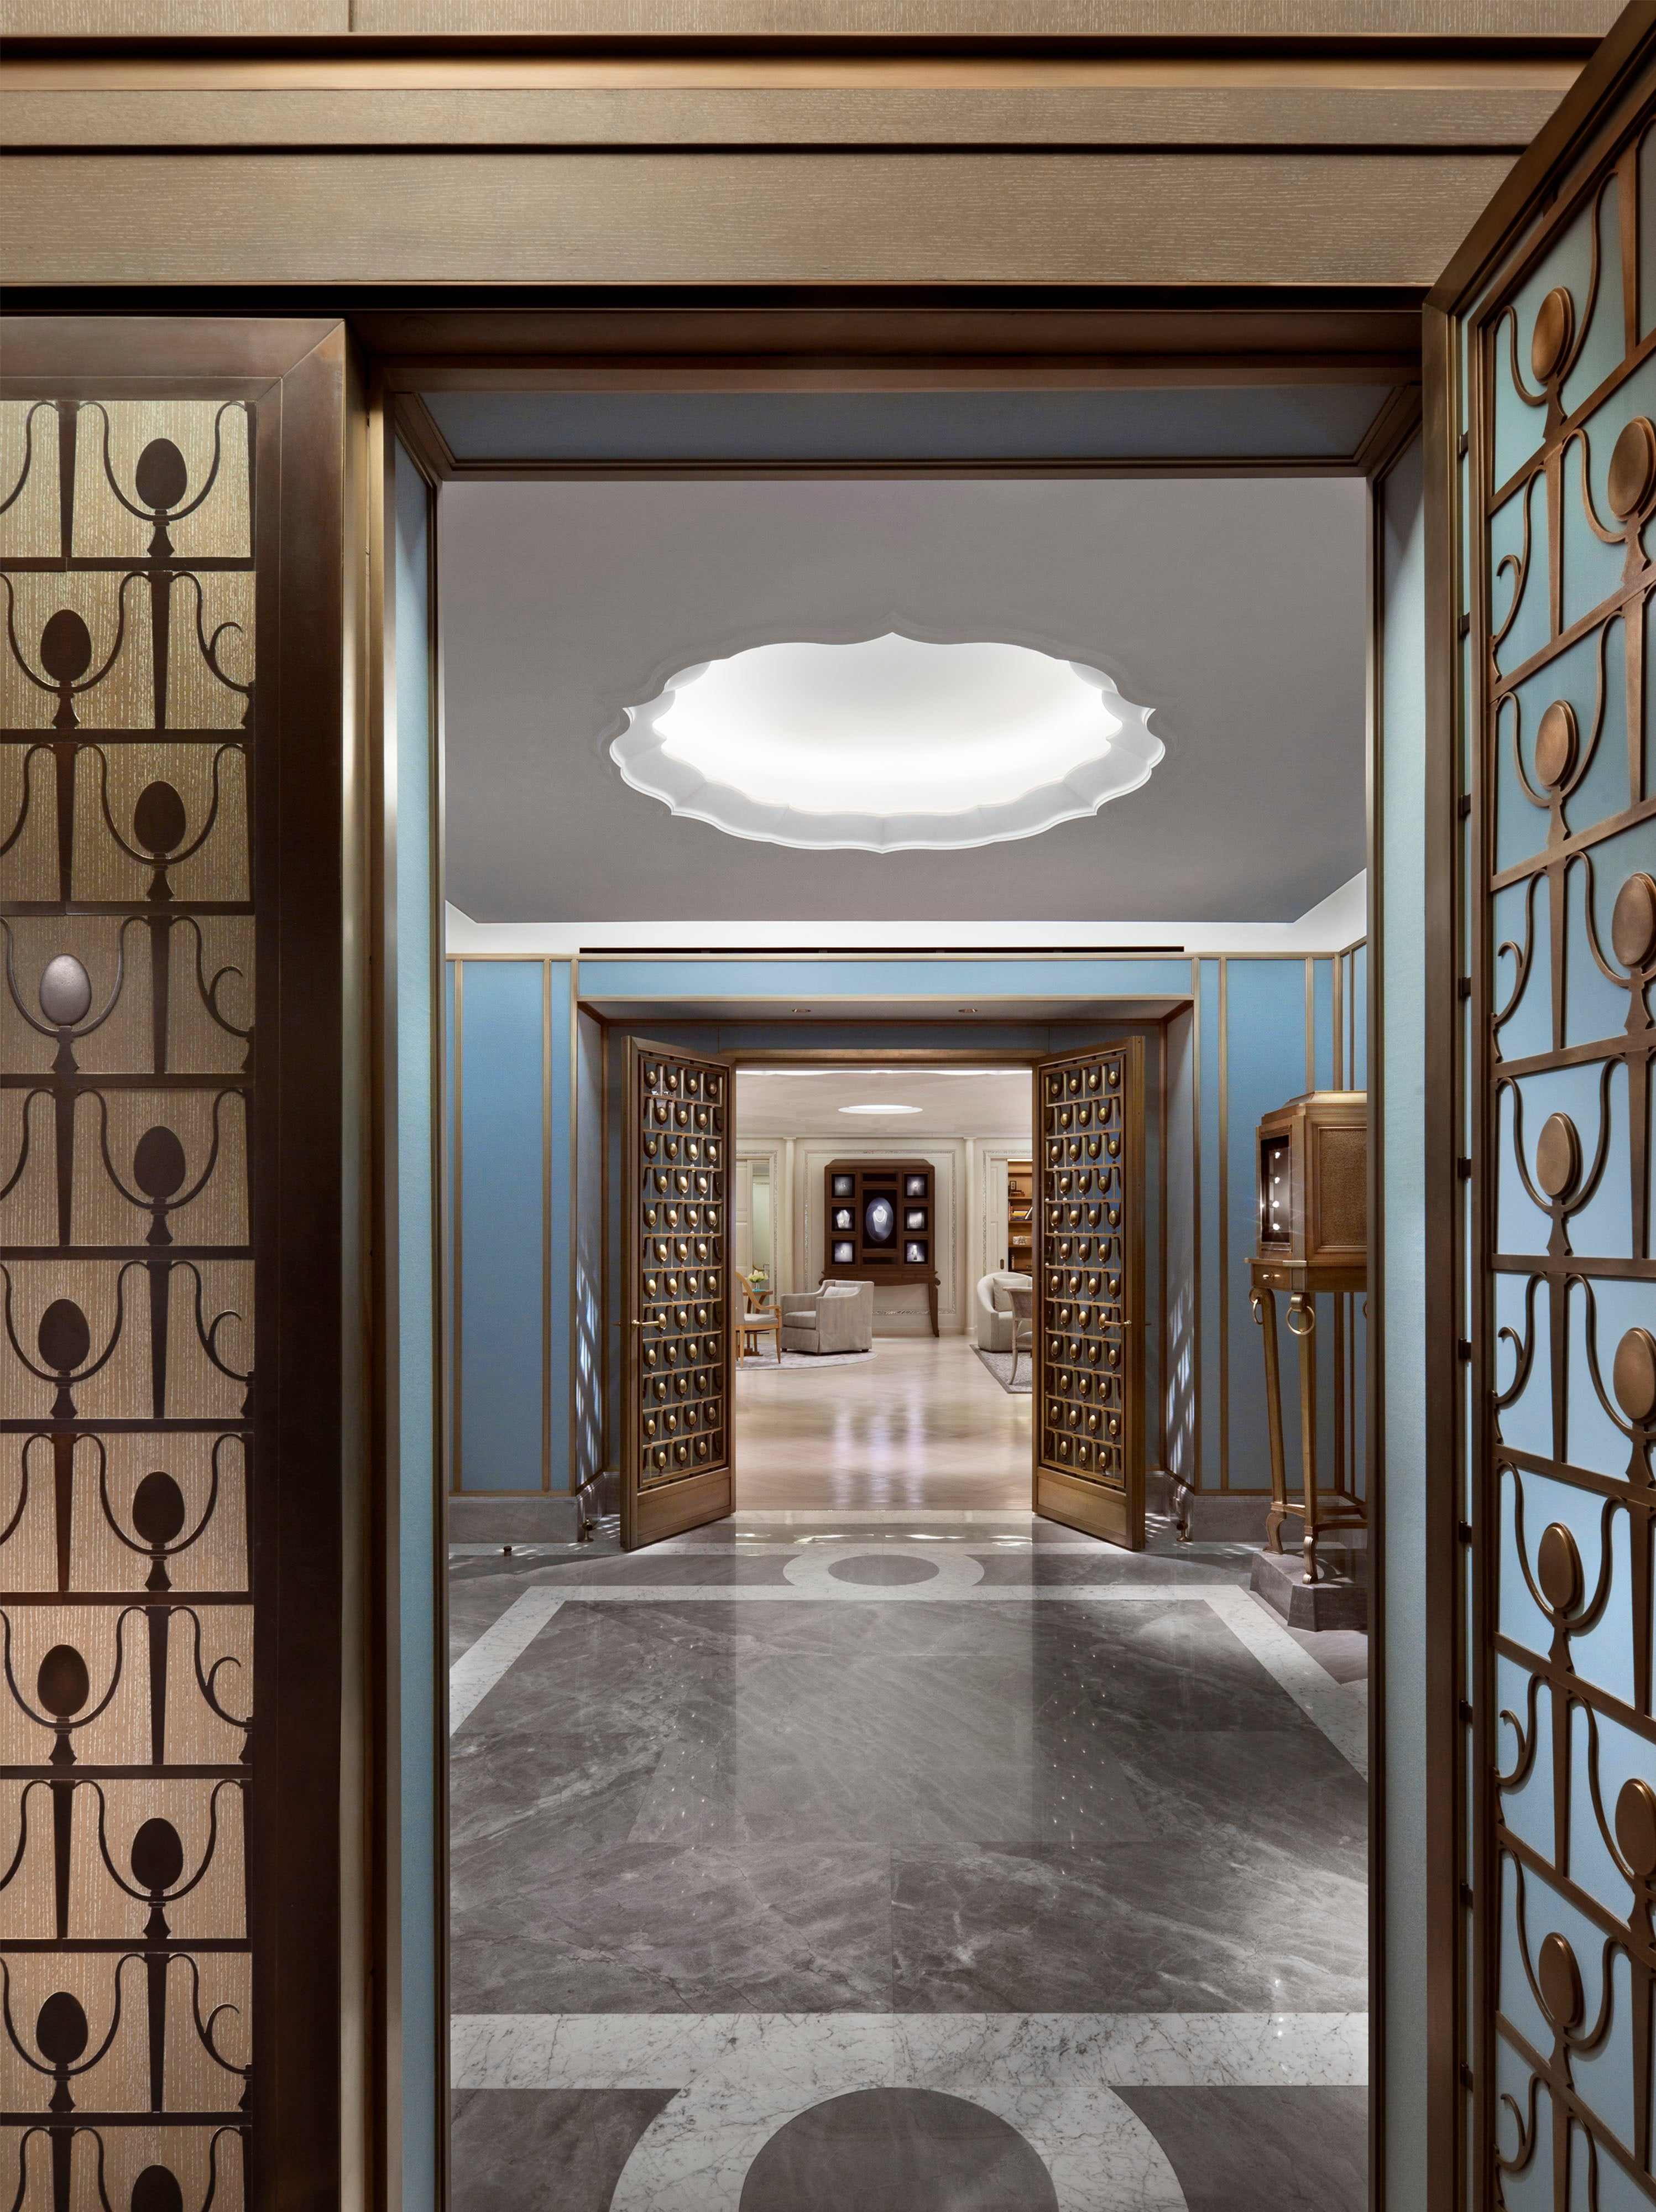 Entry Vestibule Looking To Salon By Robert A M Stern